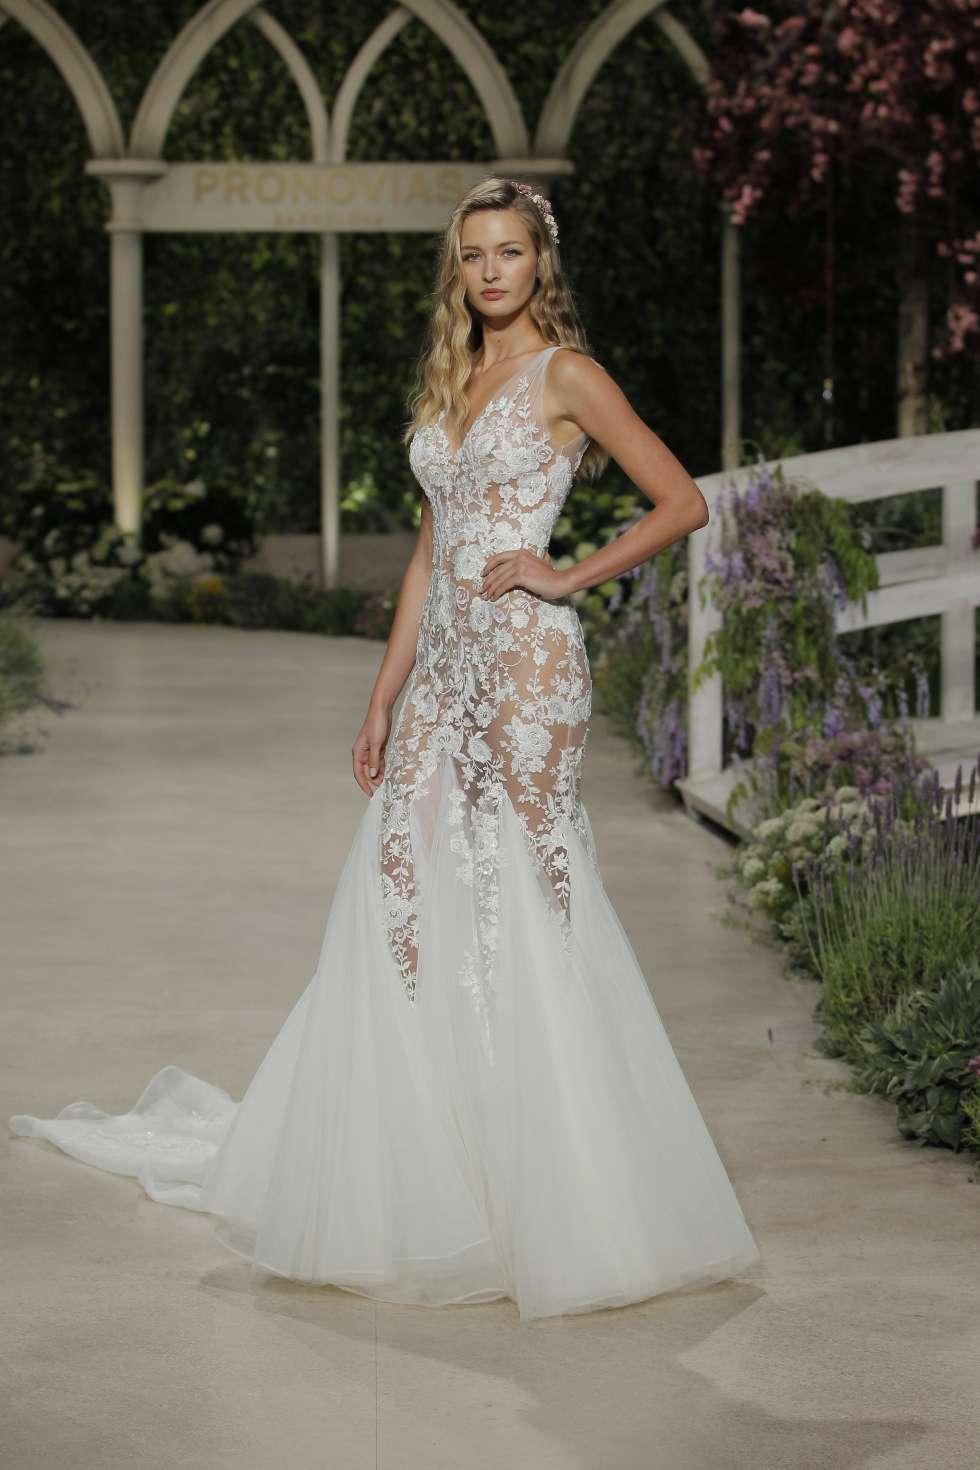 869786ab9c3 The 2019 Atelier Pronovias Wedding Dress Collection